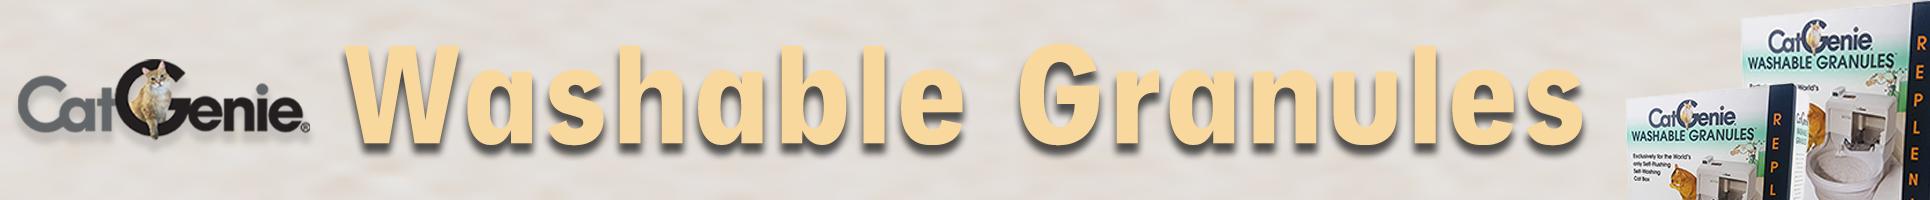 Washable Granules